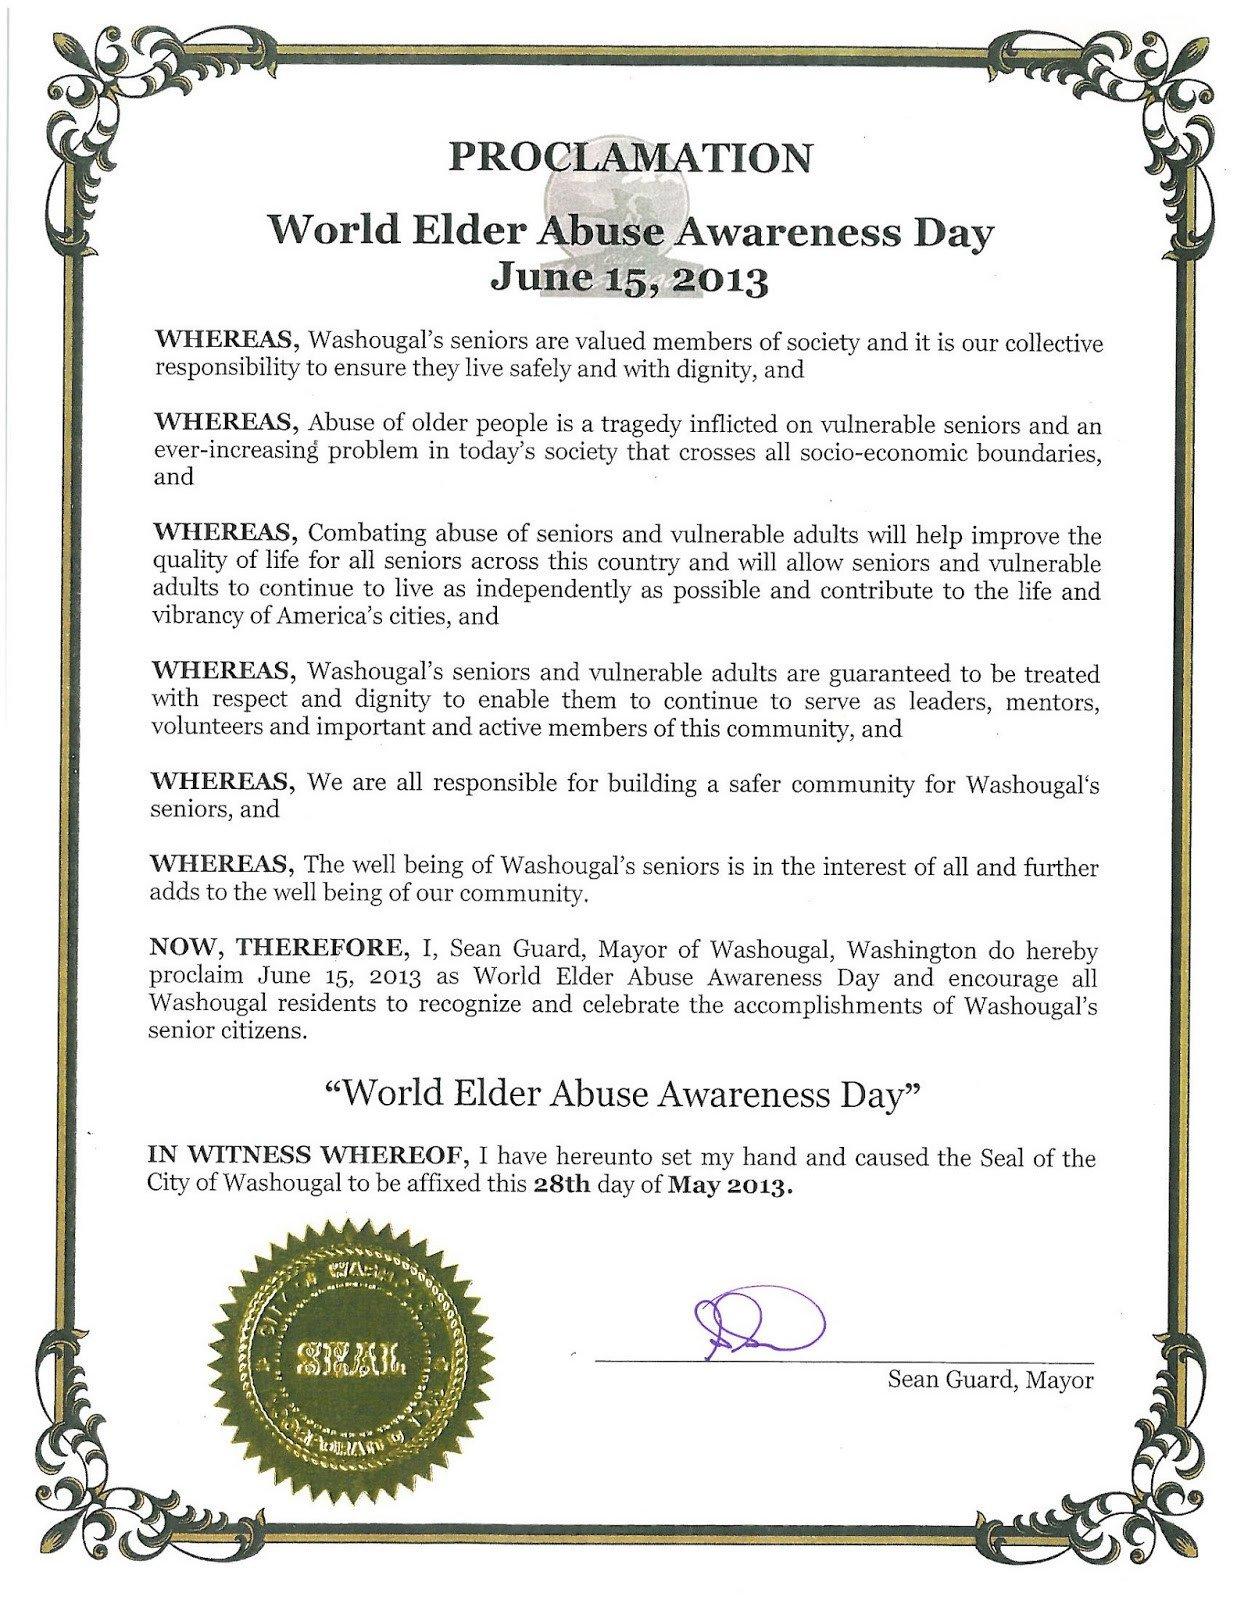 Mayoral Proclamation Template Washougal Mayor S Blog World Elder Abuse Awareness Day